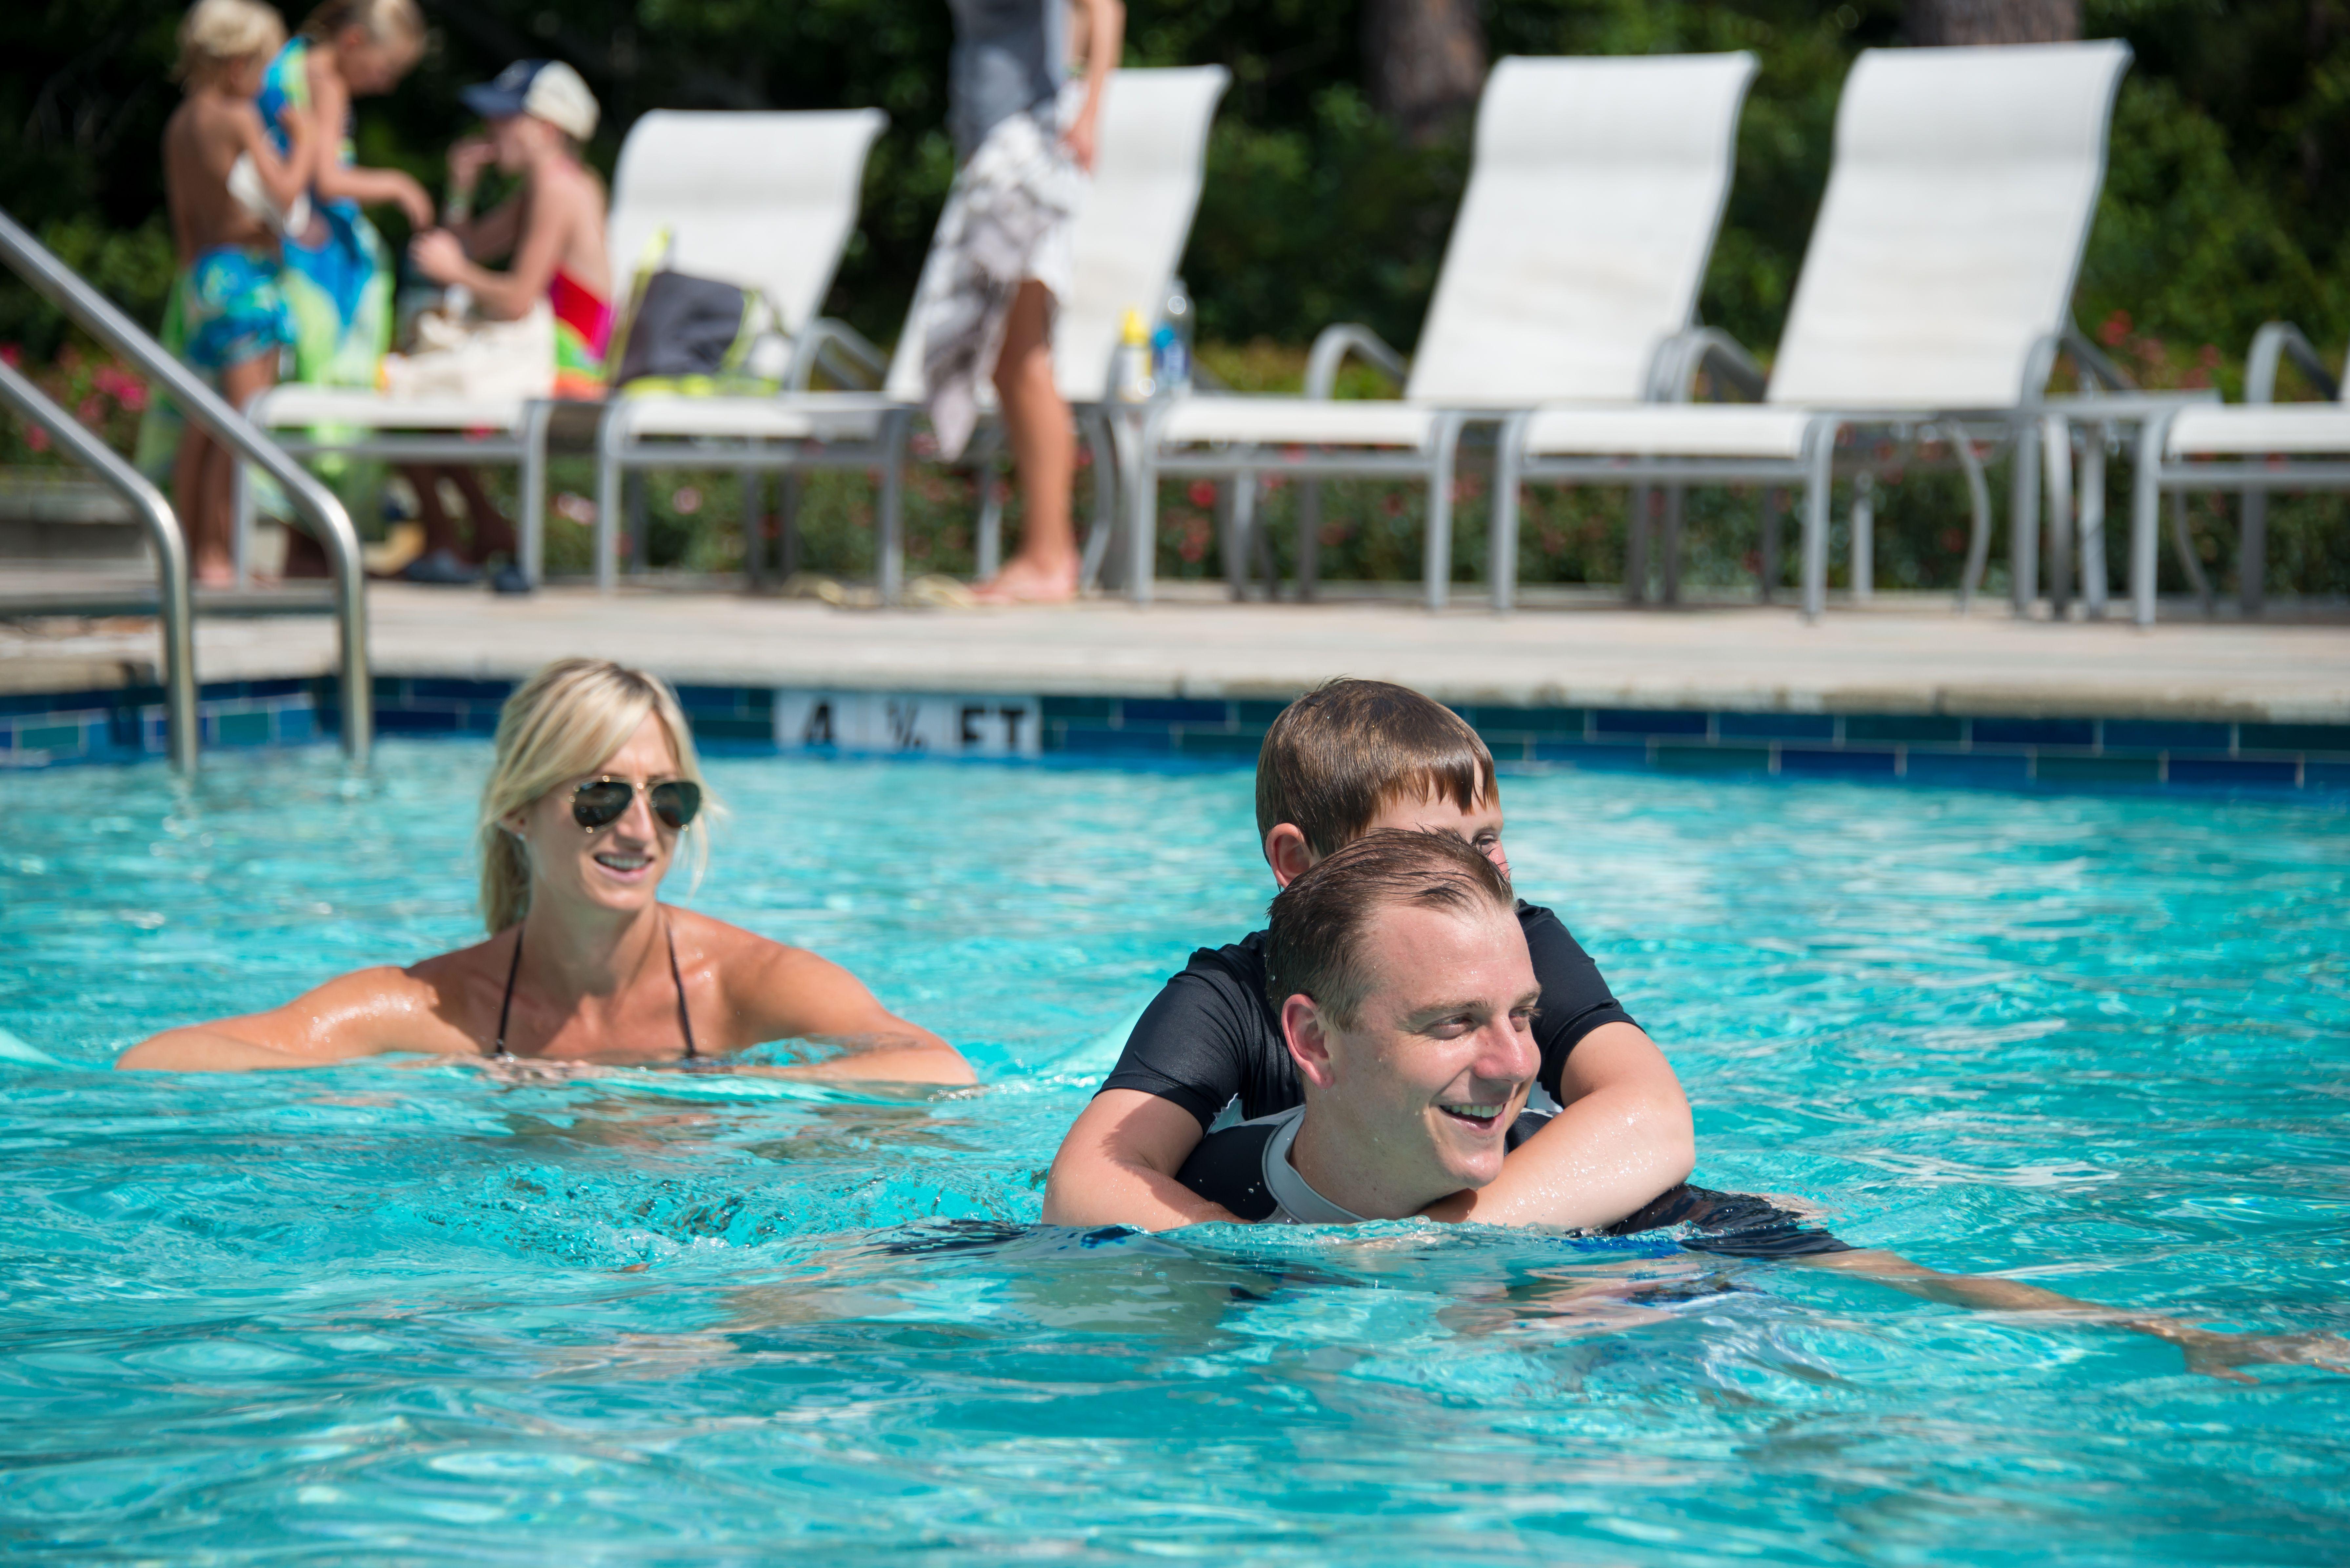 Watercolor Inn Family Pool South Walton 30a Florida